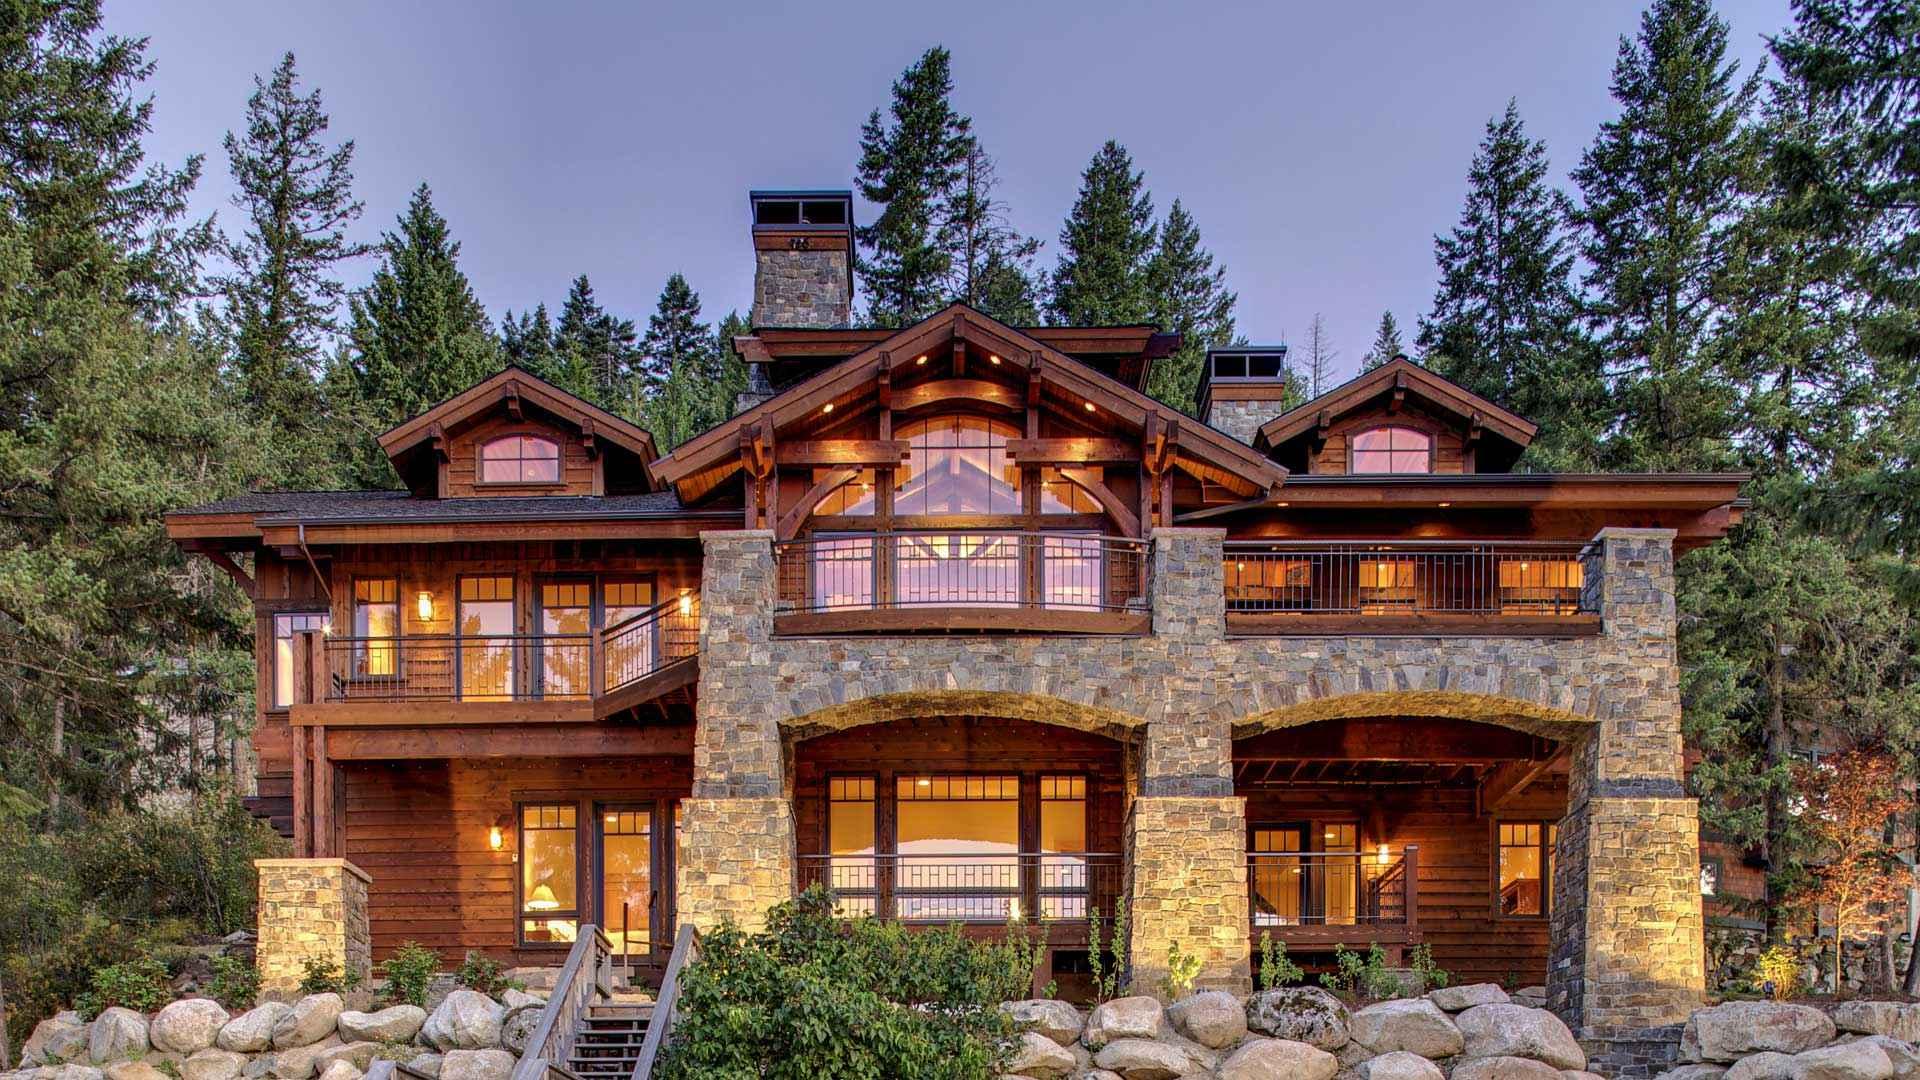 Mountain Home Developments in British Columbia